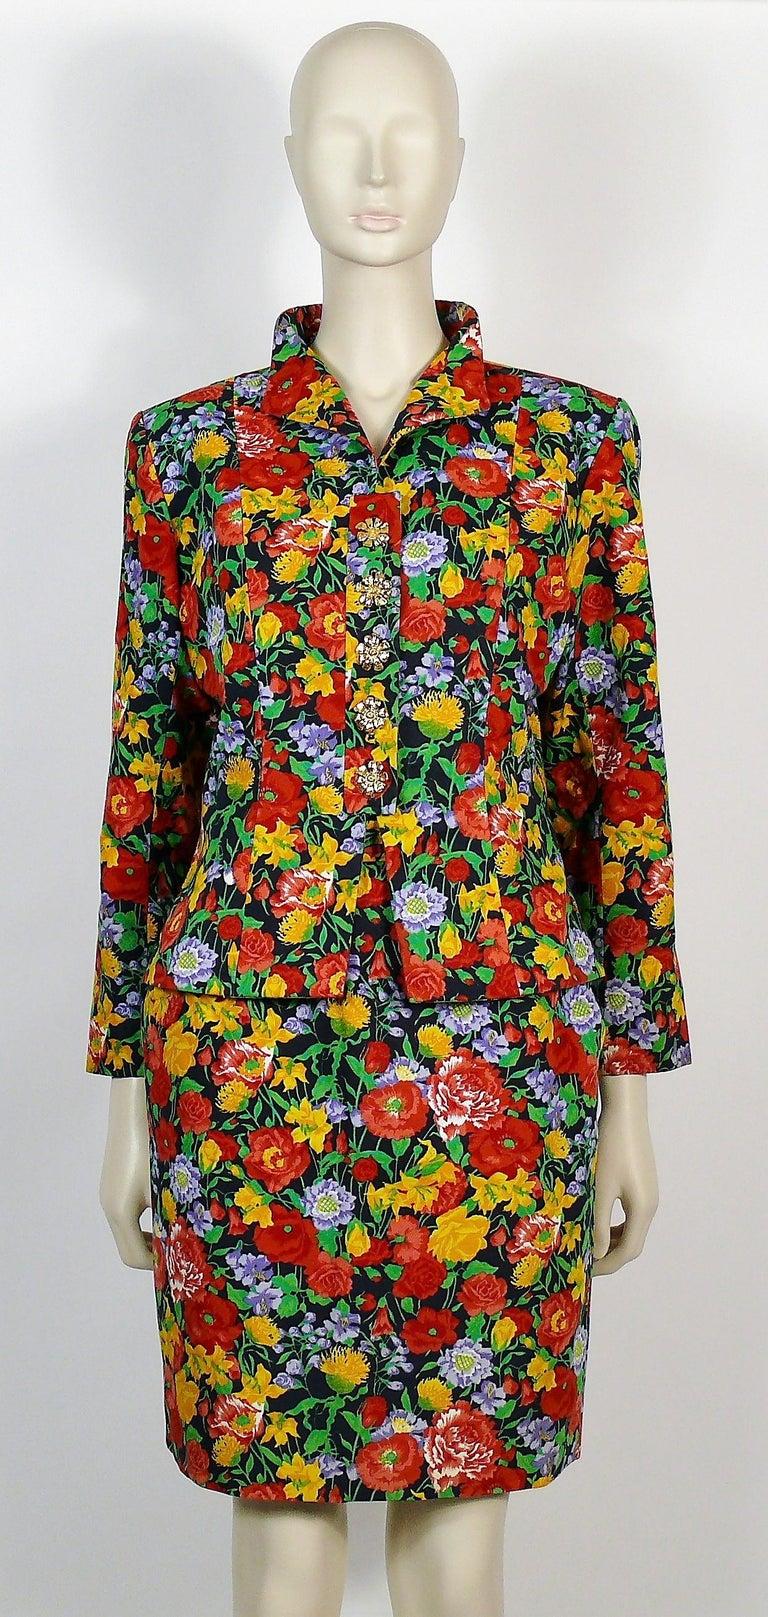 Women's Yves Saint Laurent YSL Vintage Floral Print Skirt Suit Spring/Summer 1992 For Sale